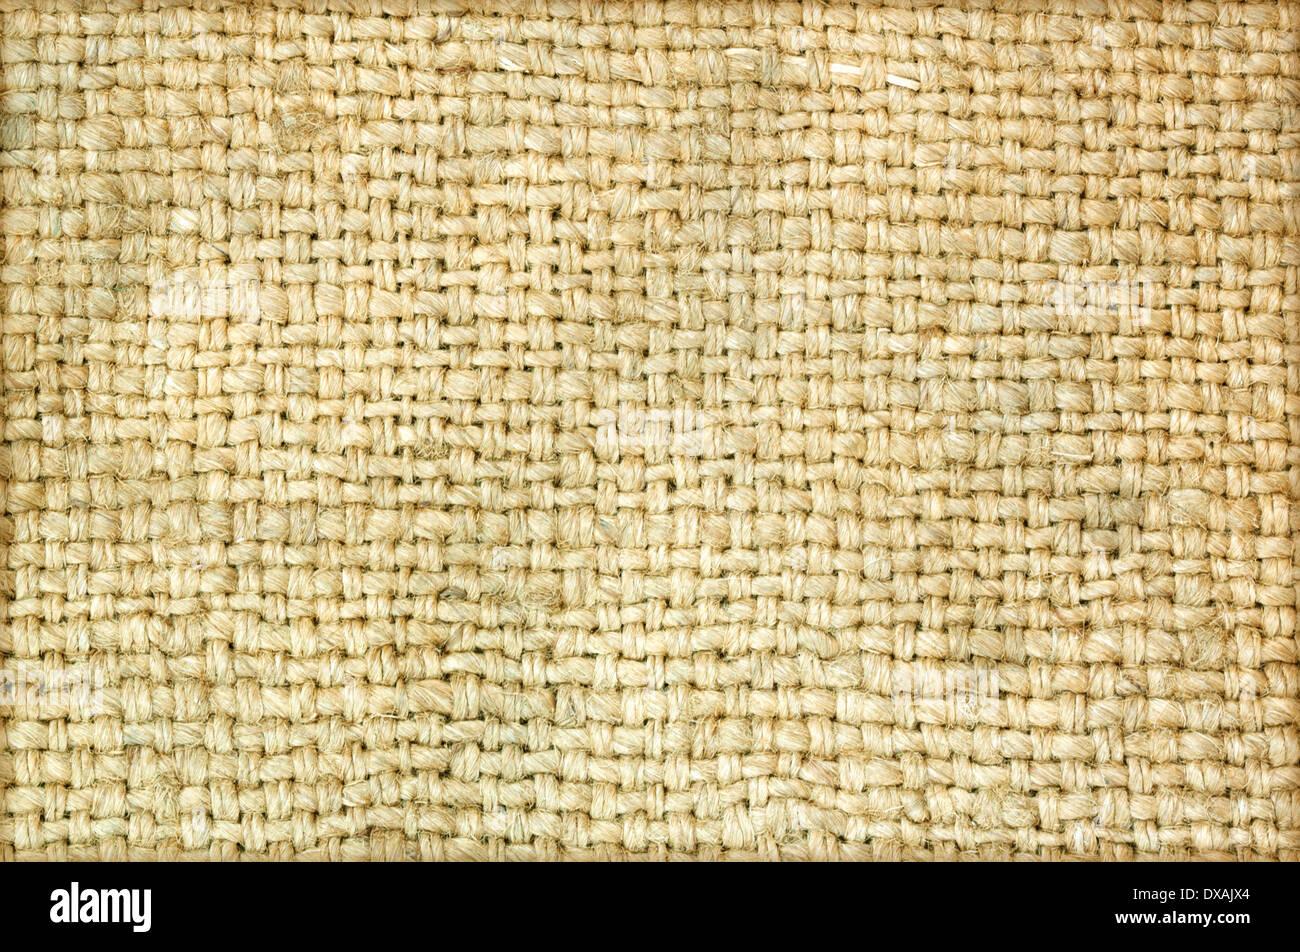 Sacks of hemp rope background vintage details. - Stock Image